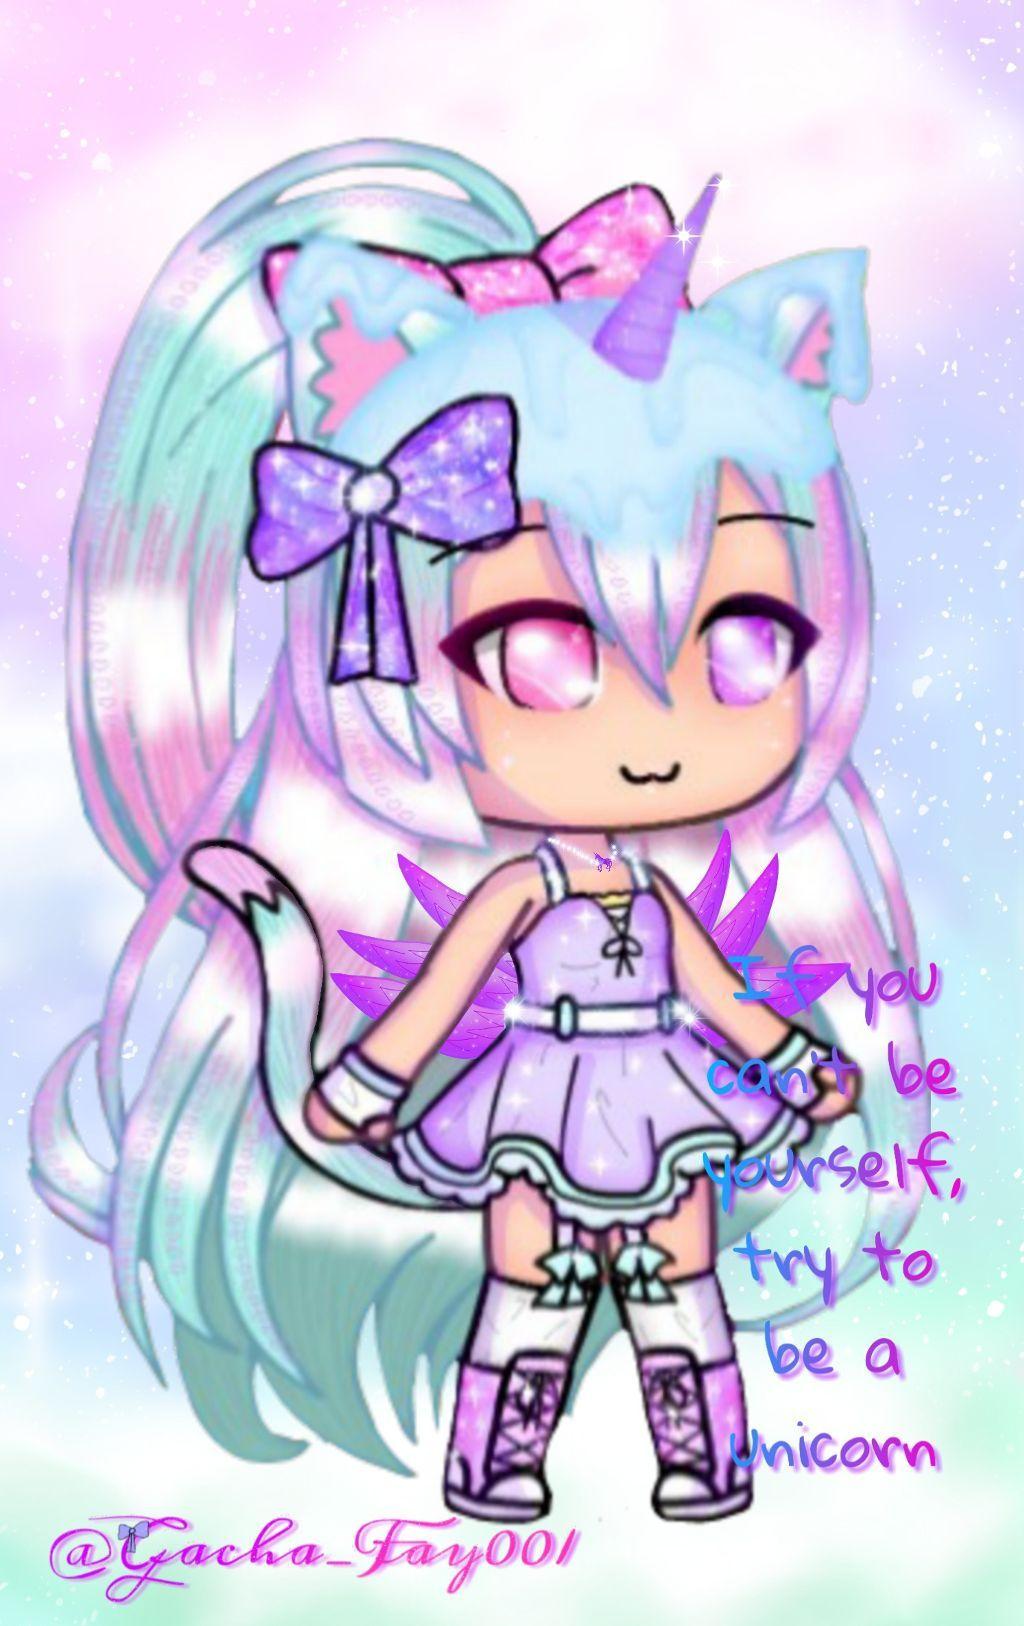 Fay The Unicorn Girl Cute Anime Chibi Unicorn Illustration Unicorn Wallpaper Pastel